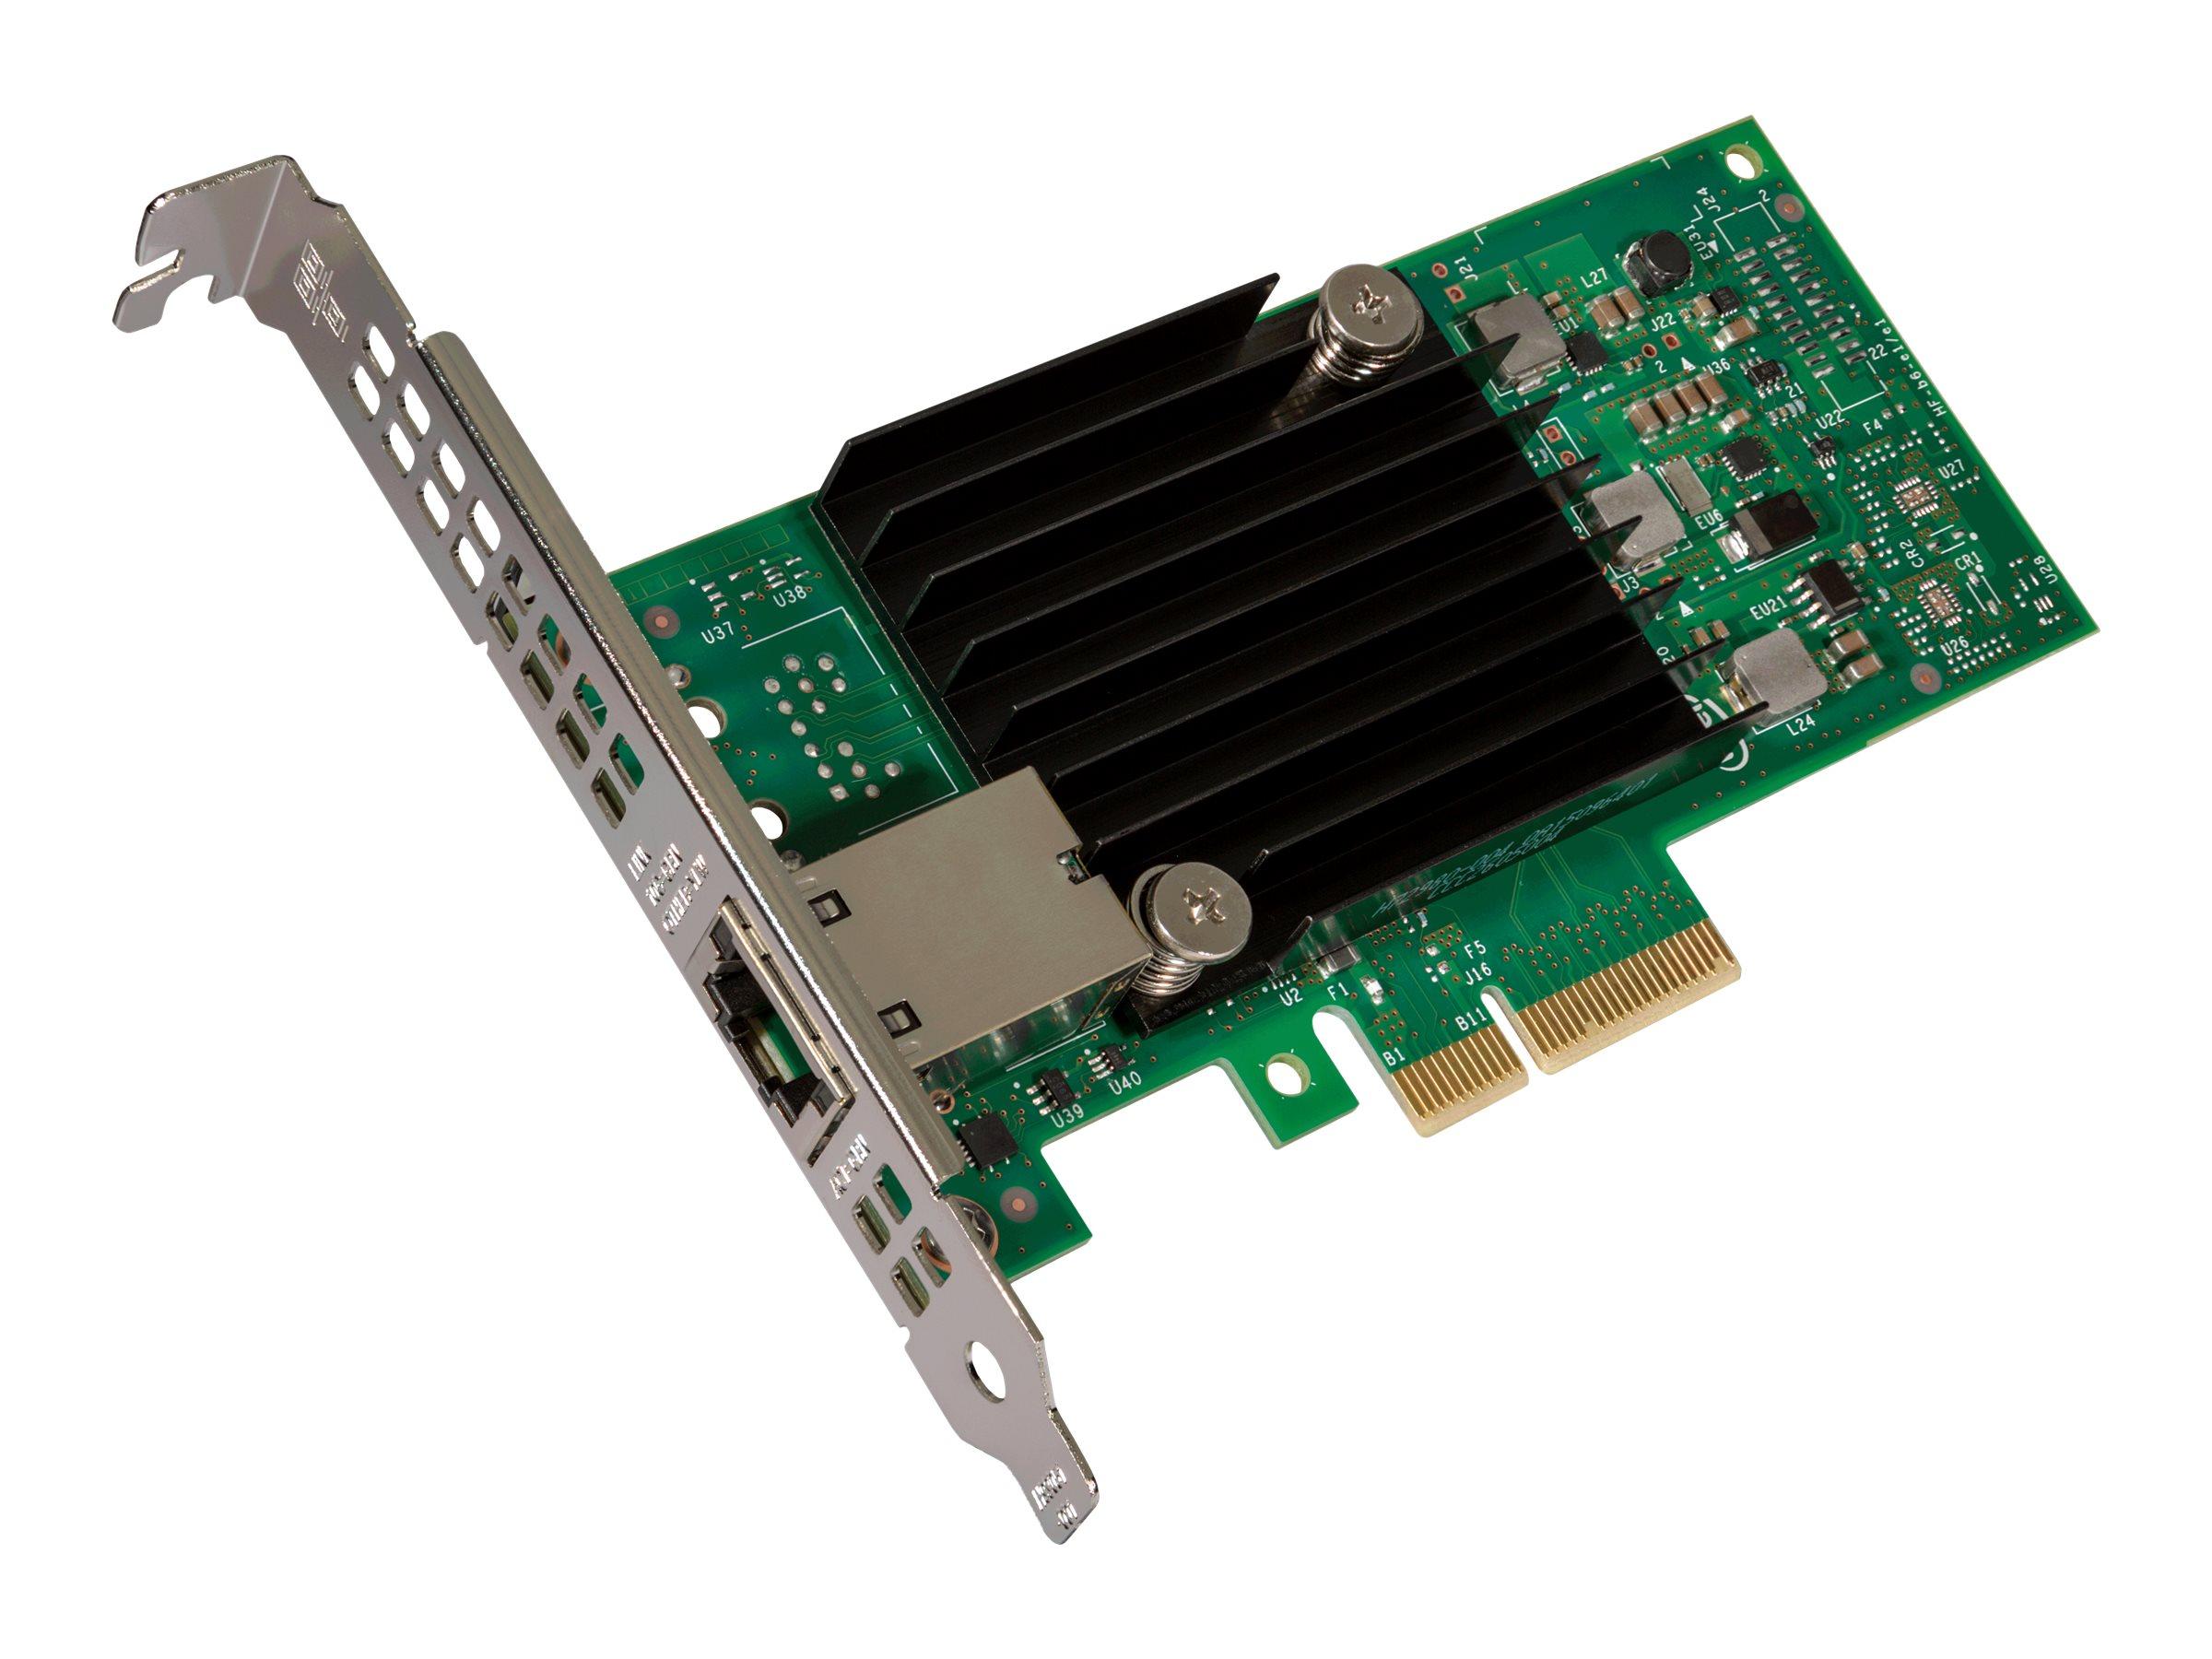 Intel Ethernet Converged Network Adapter X550-T1 - Netzwerkadapter - PCIe 3.0 x4 Low-Profile - 10Gb Ethernet x 1